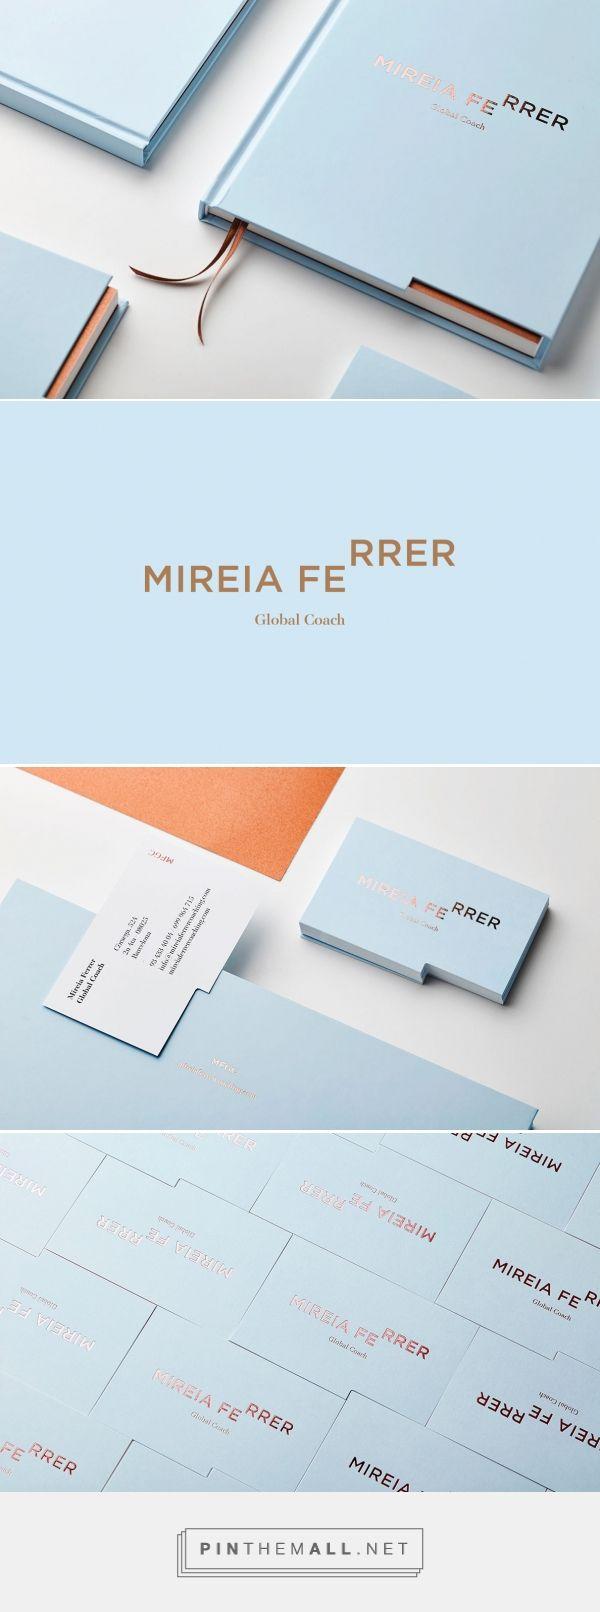 Mireia Ferrer on Behance - created via https://pinthemall.net